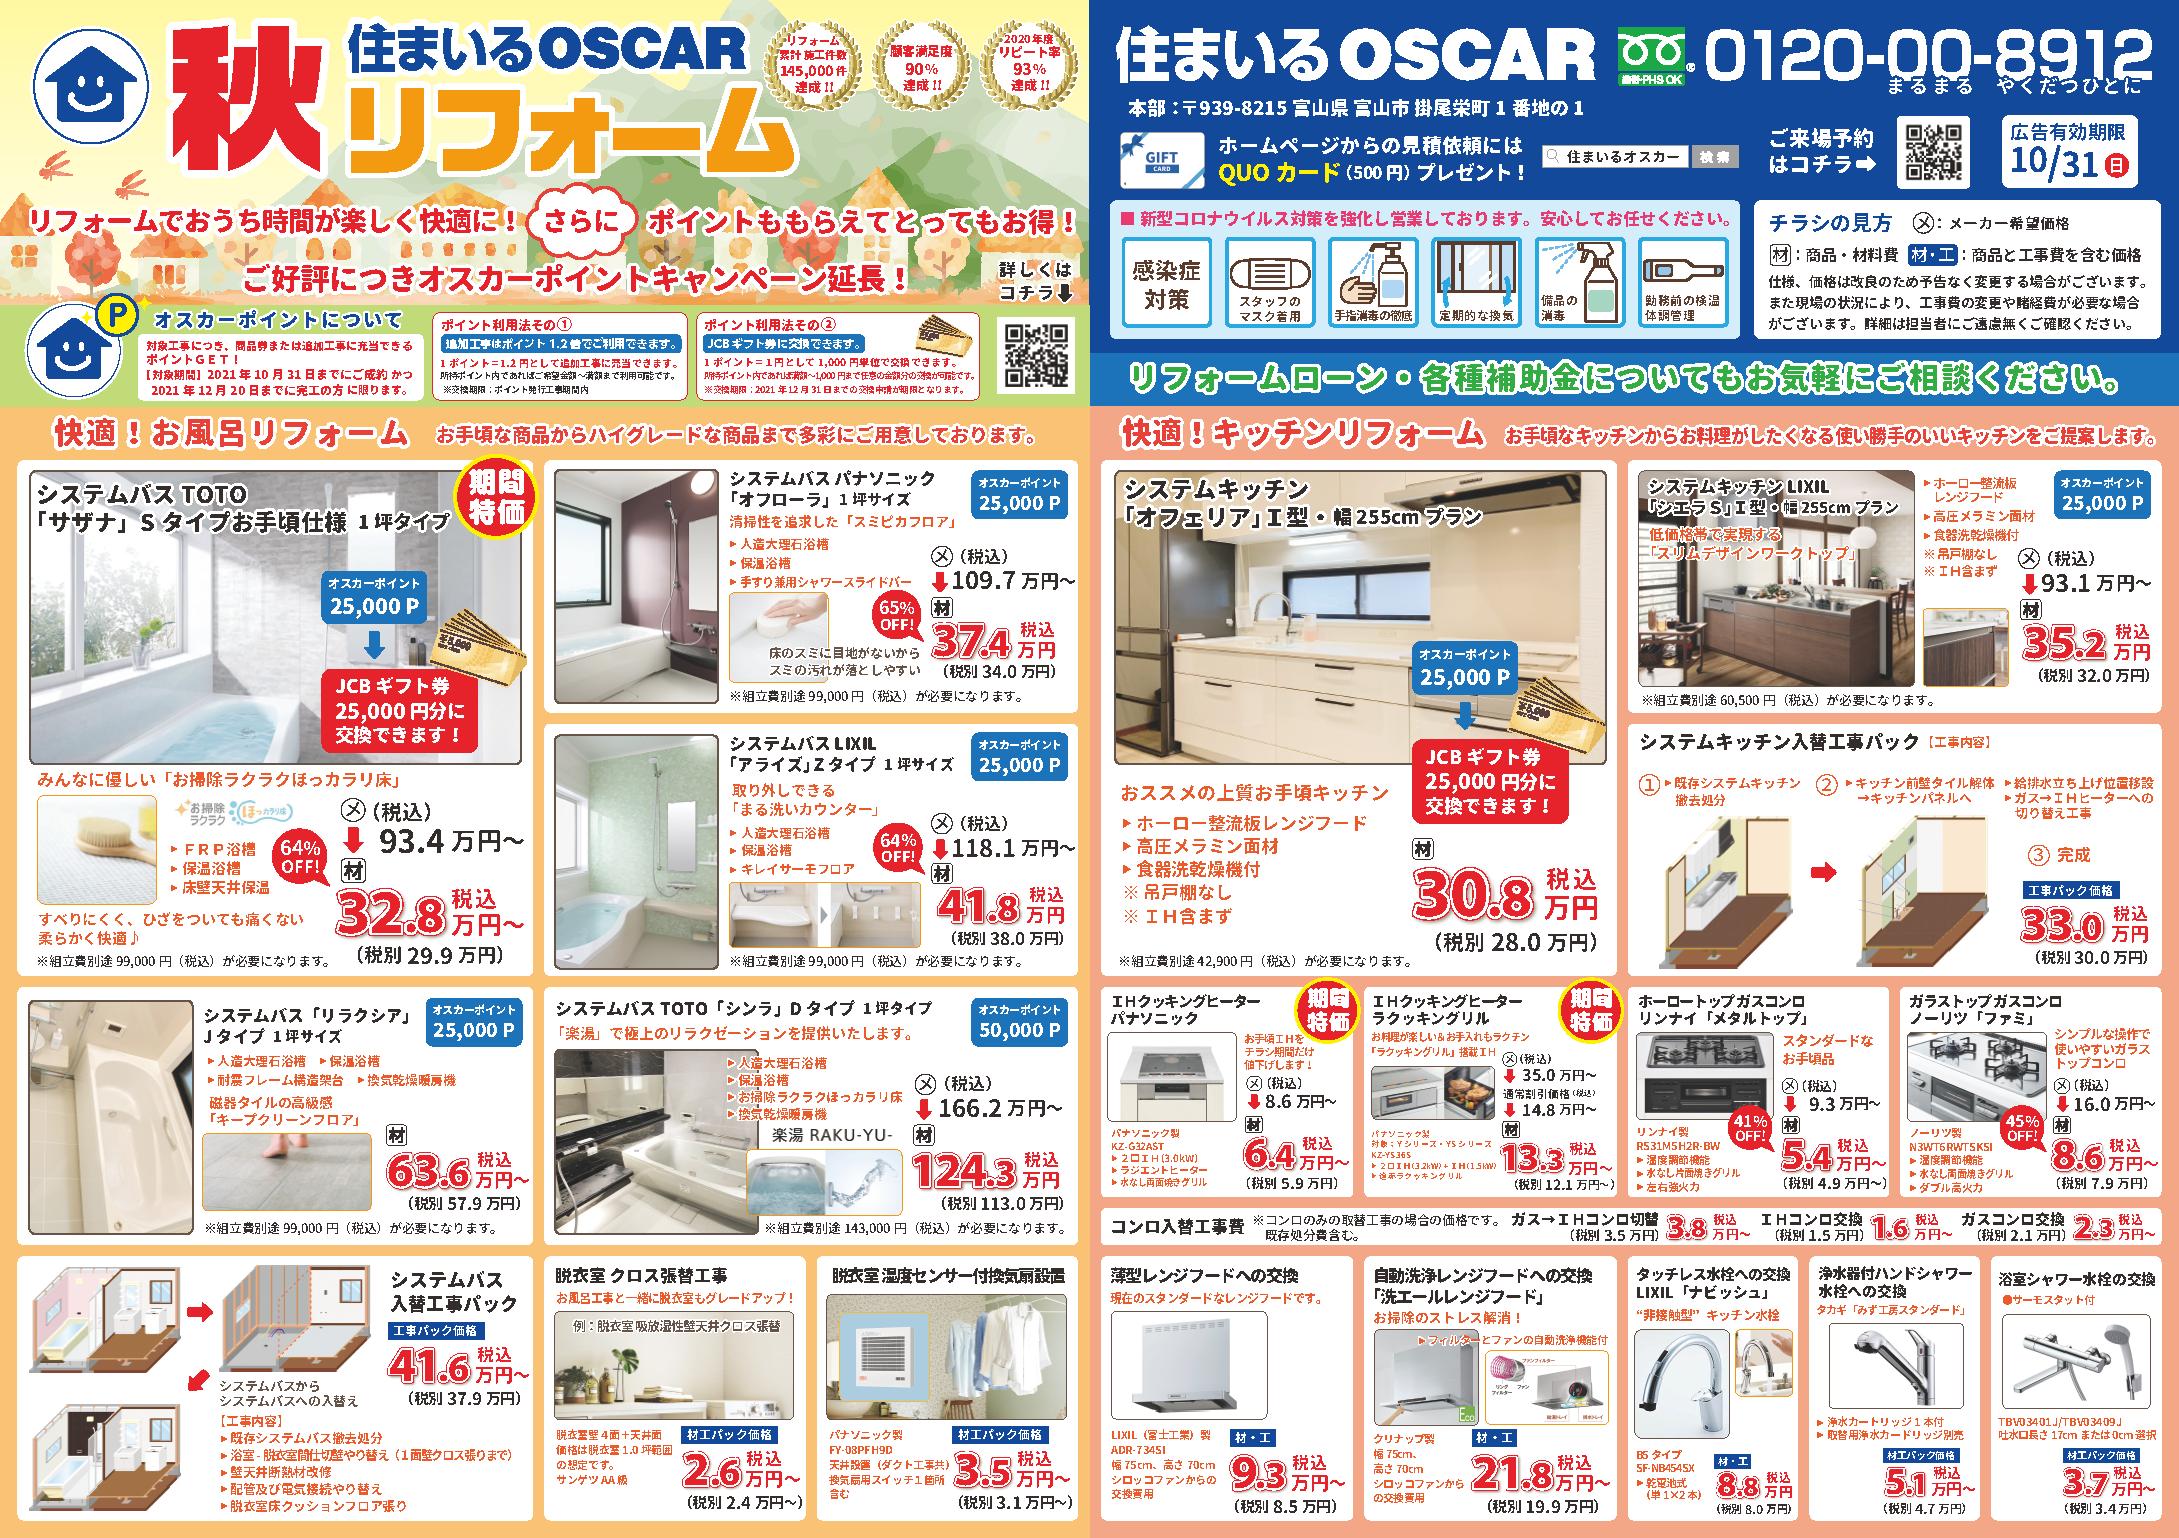 https://www.smile-oscar.jp/reform/wp-content/uploads/sites/2/2021/08/88f8ae0356ac1d843123d29e9543a6ad.png